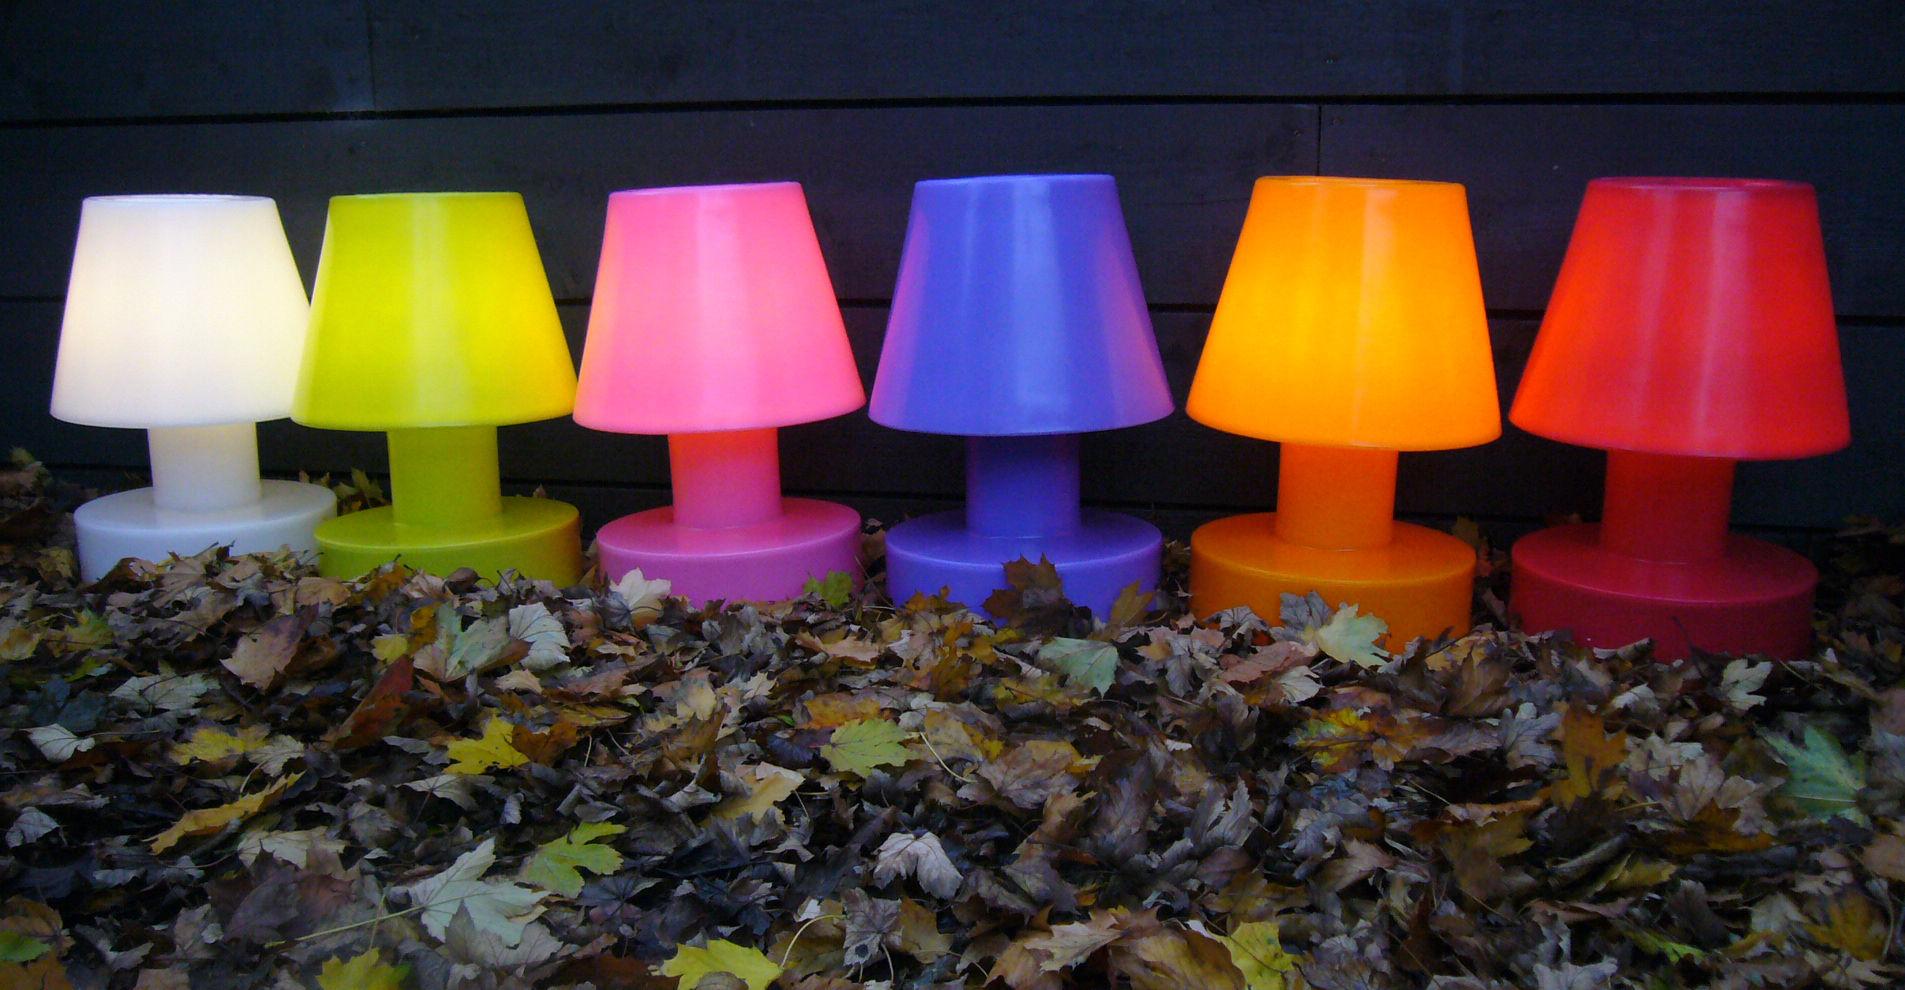 Lampada Senza Fili   Portatile Senza Filo Ricaricabile   H 40 Cm Bianco   H  40 Cm By Bloom! | Made In Design